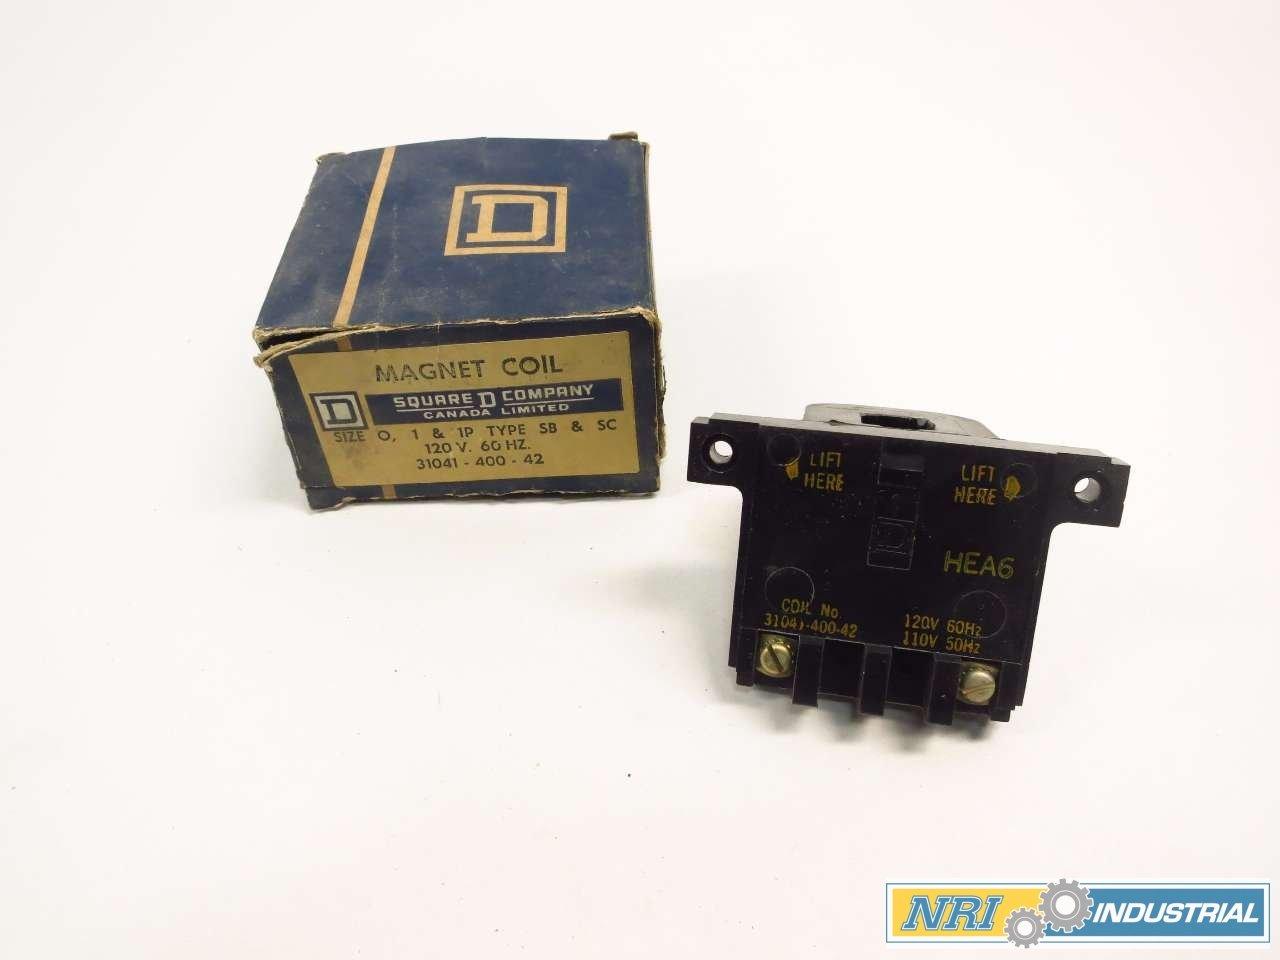 NEW SQUARE D 31041-400-42 MAGNET COIL 120V-AC SIZE 0 1 & 1P D520913